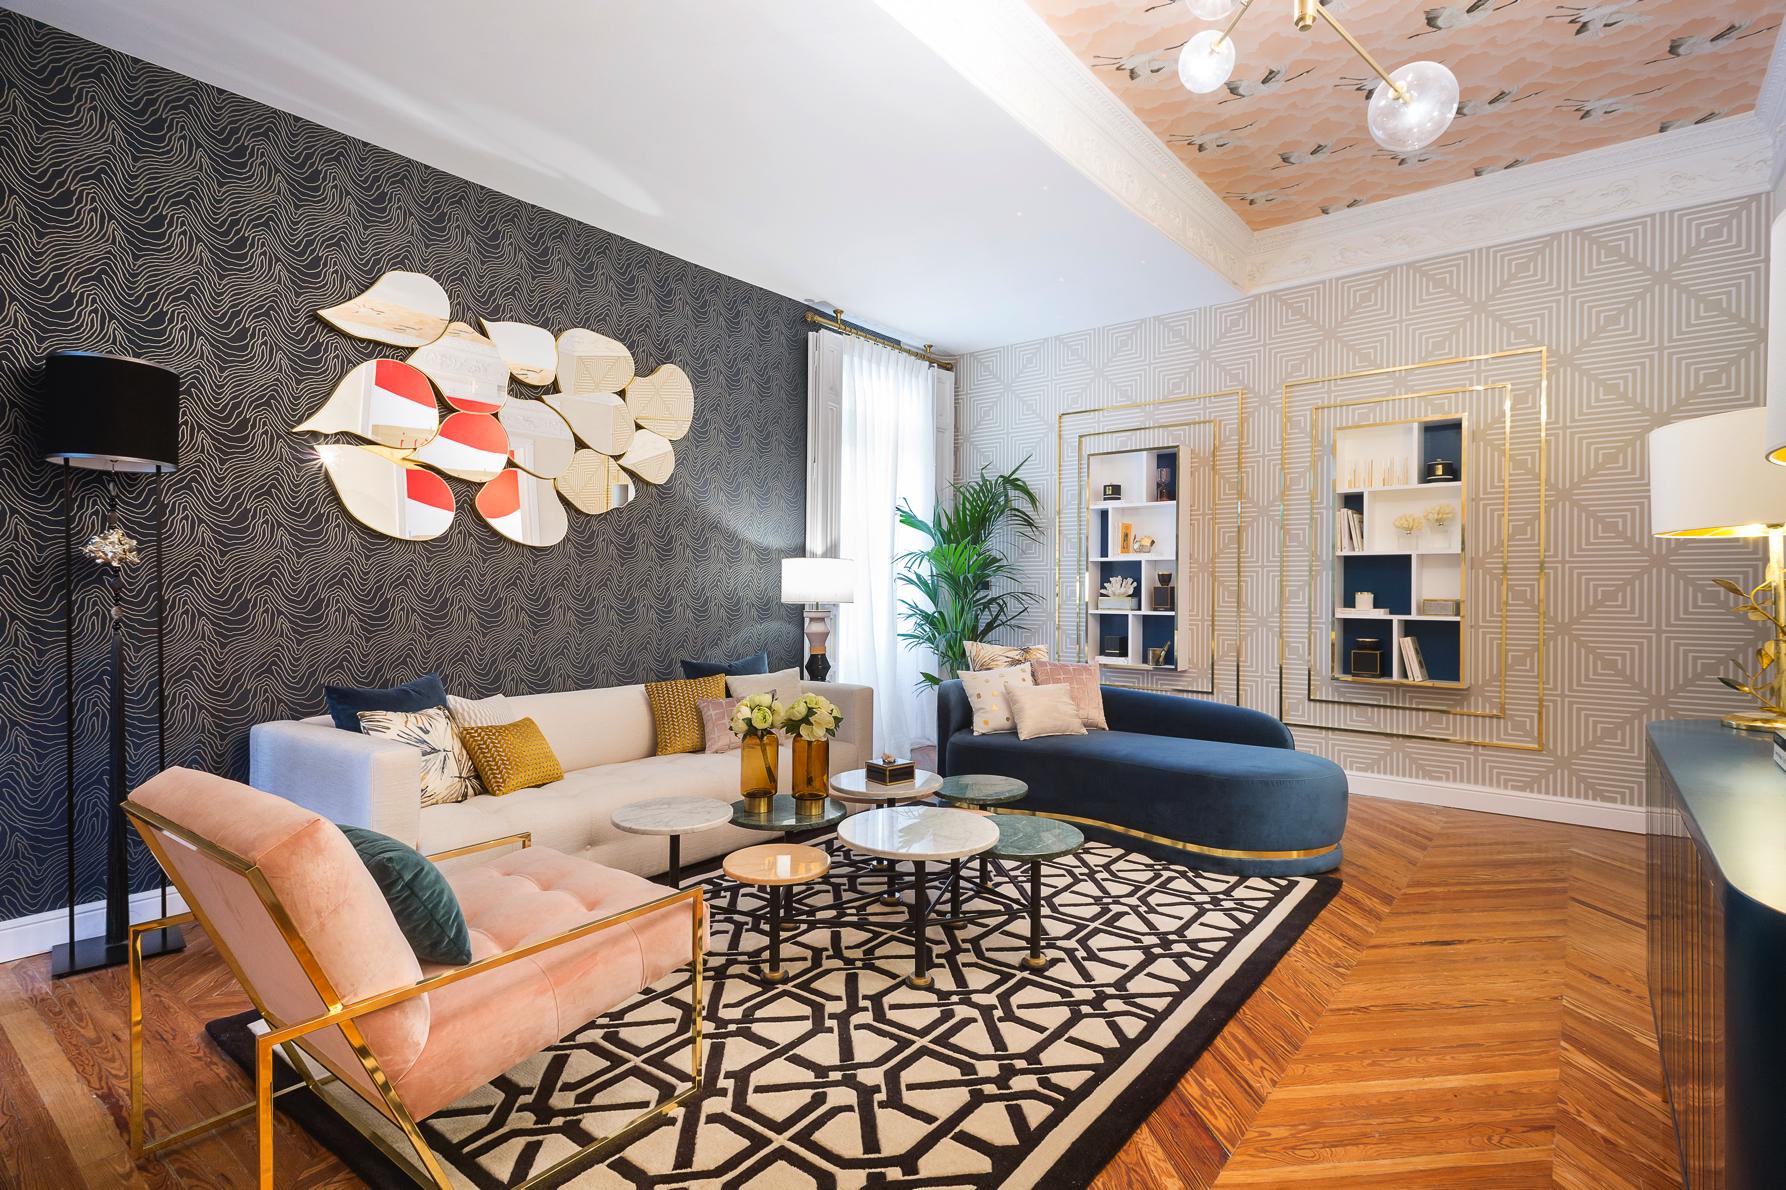 casa-decor-2017-vgliving-02